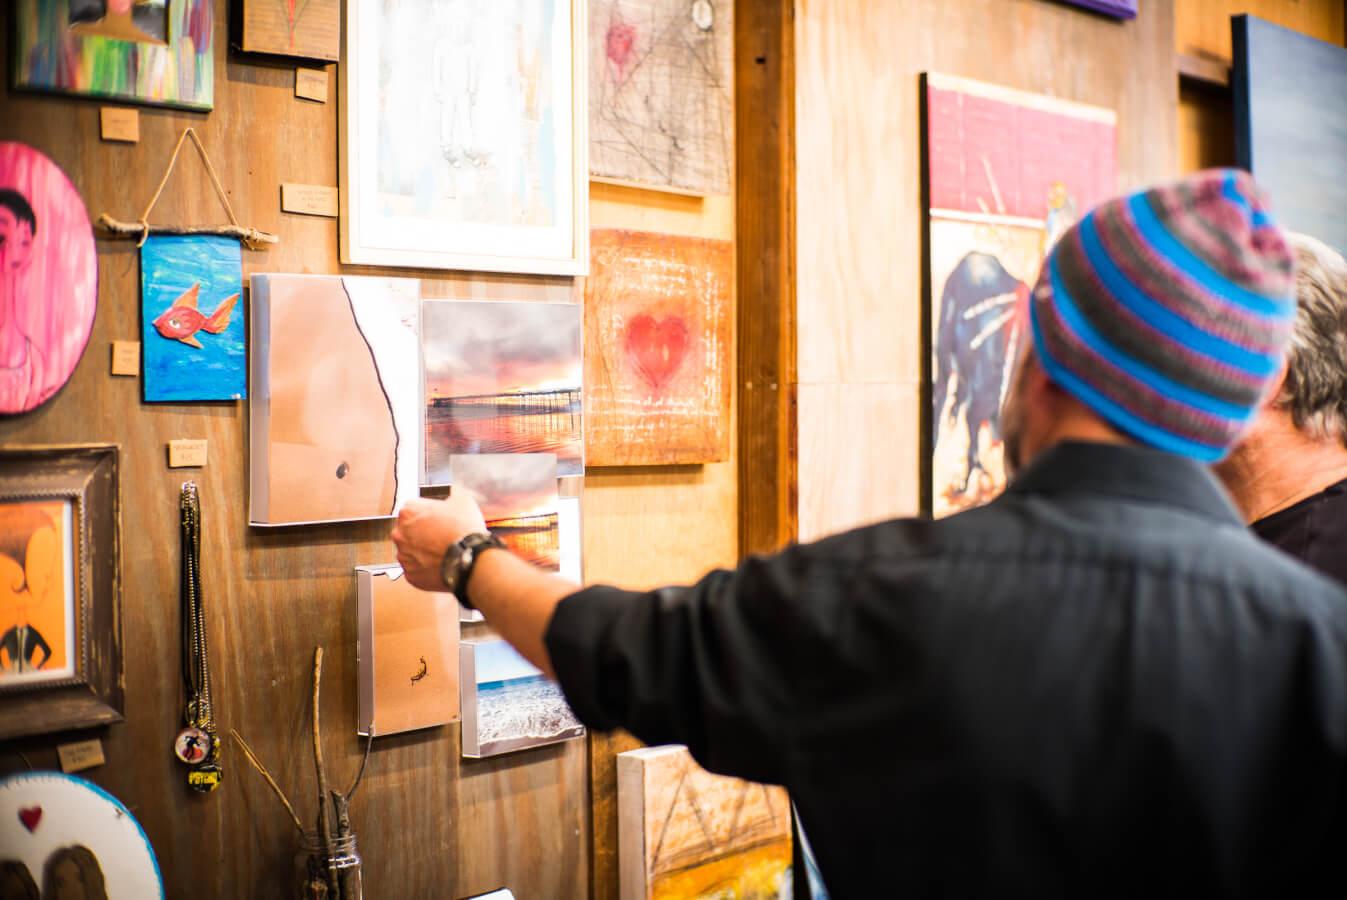 City Art Studios